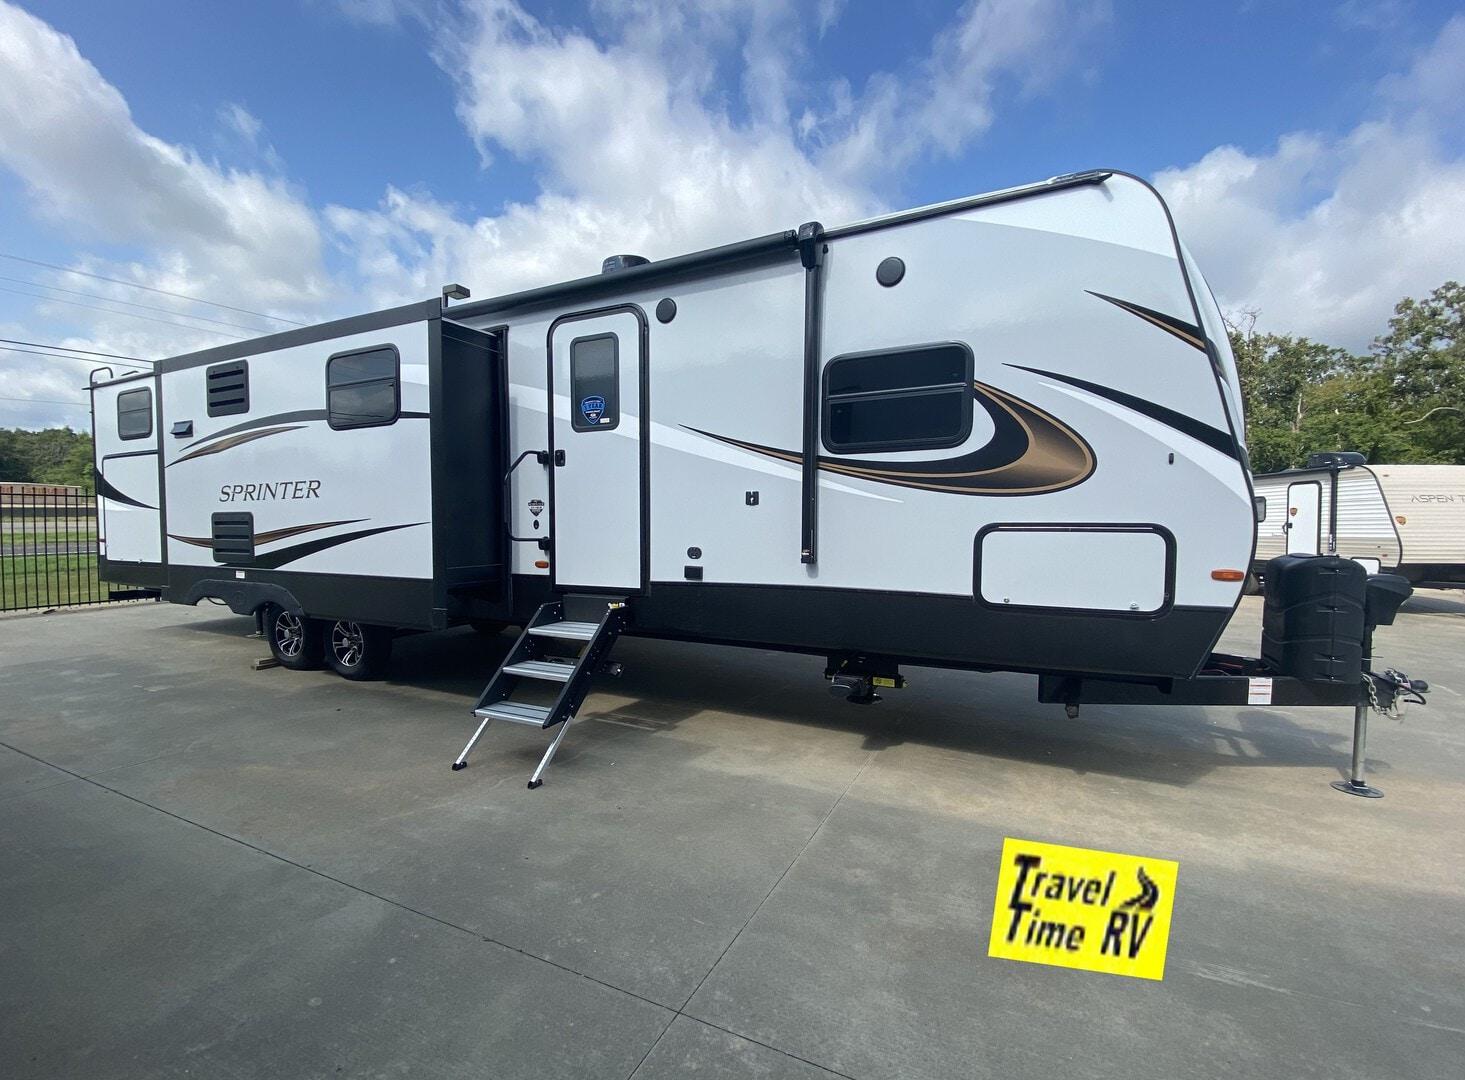 New, 2021, Keystone, Sprinter Limited (Travel Trailer) 341BIK, Travel Trailers